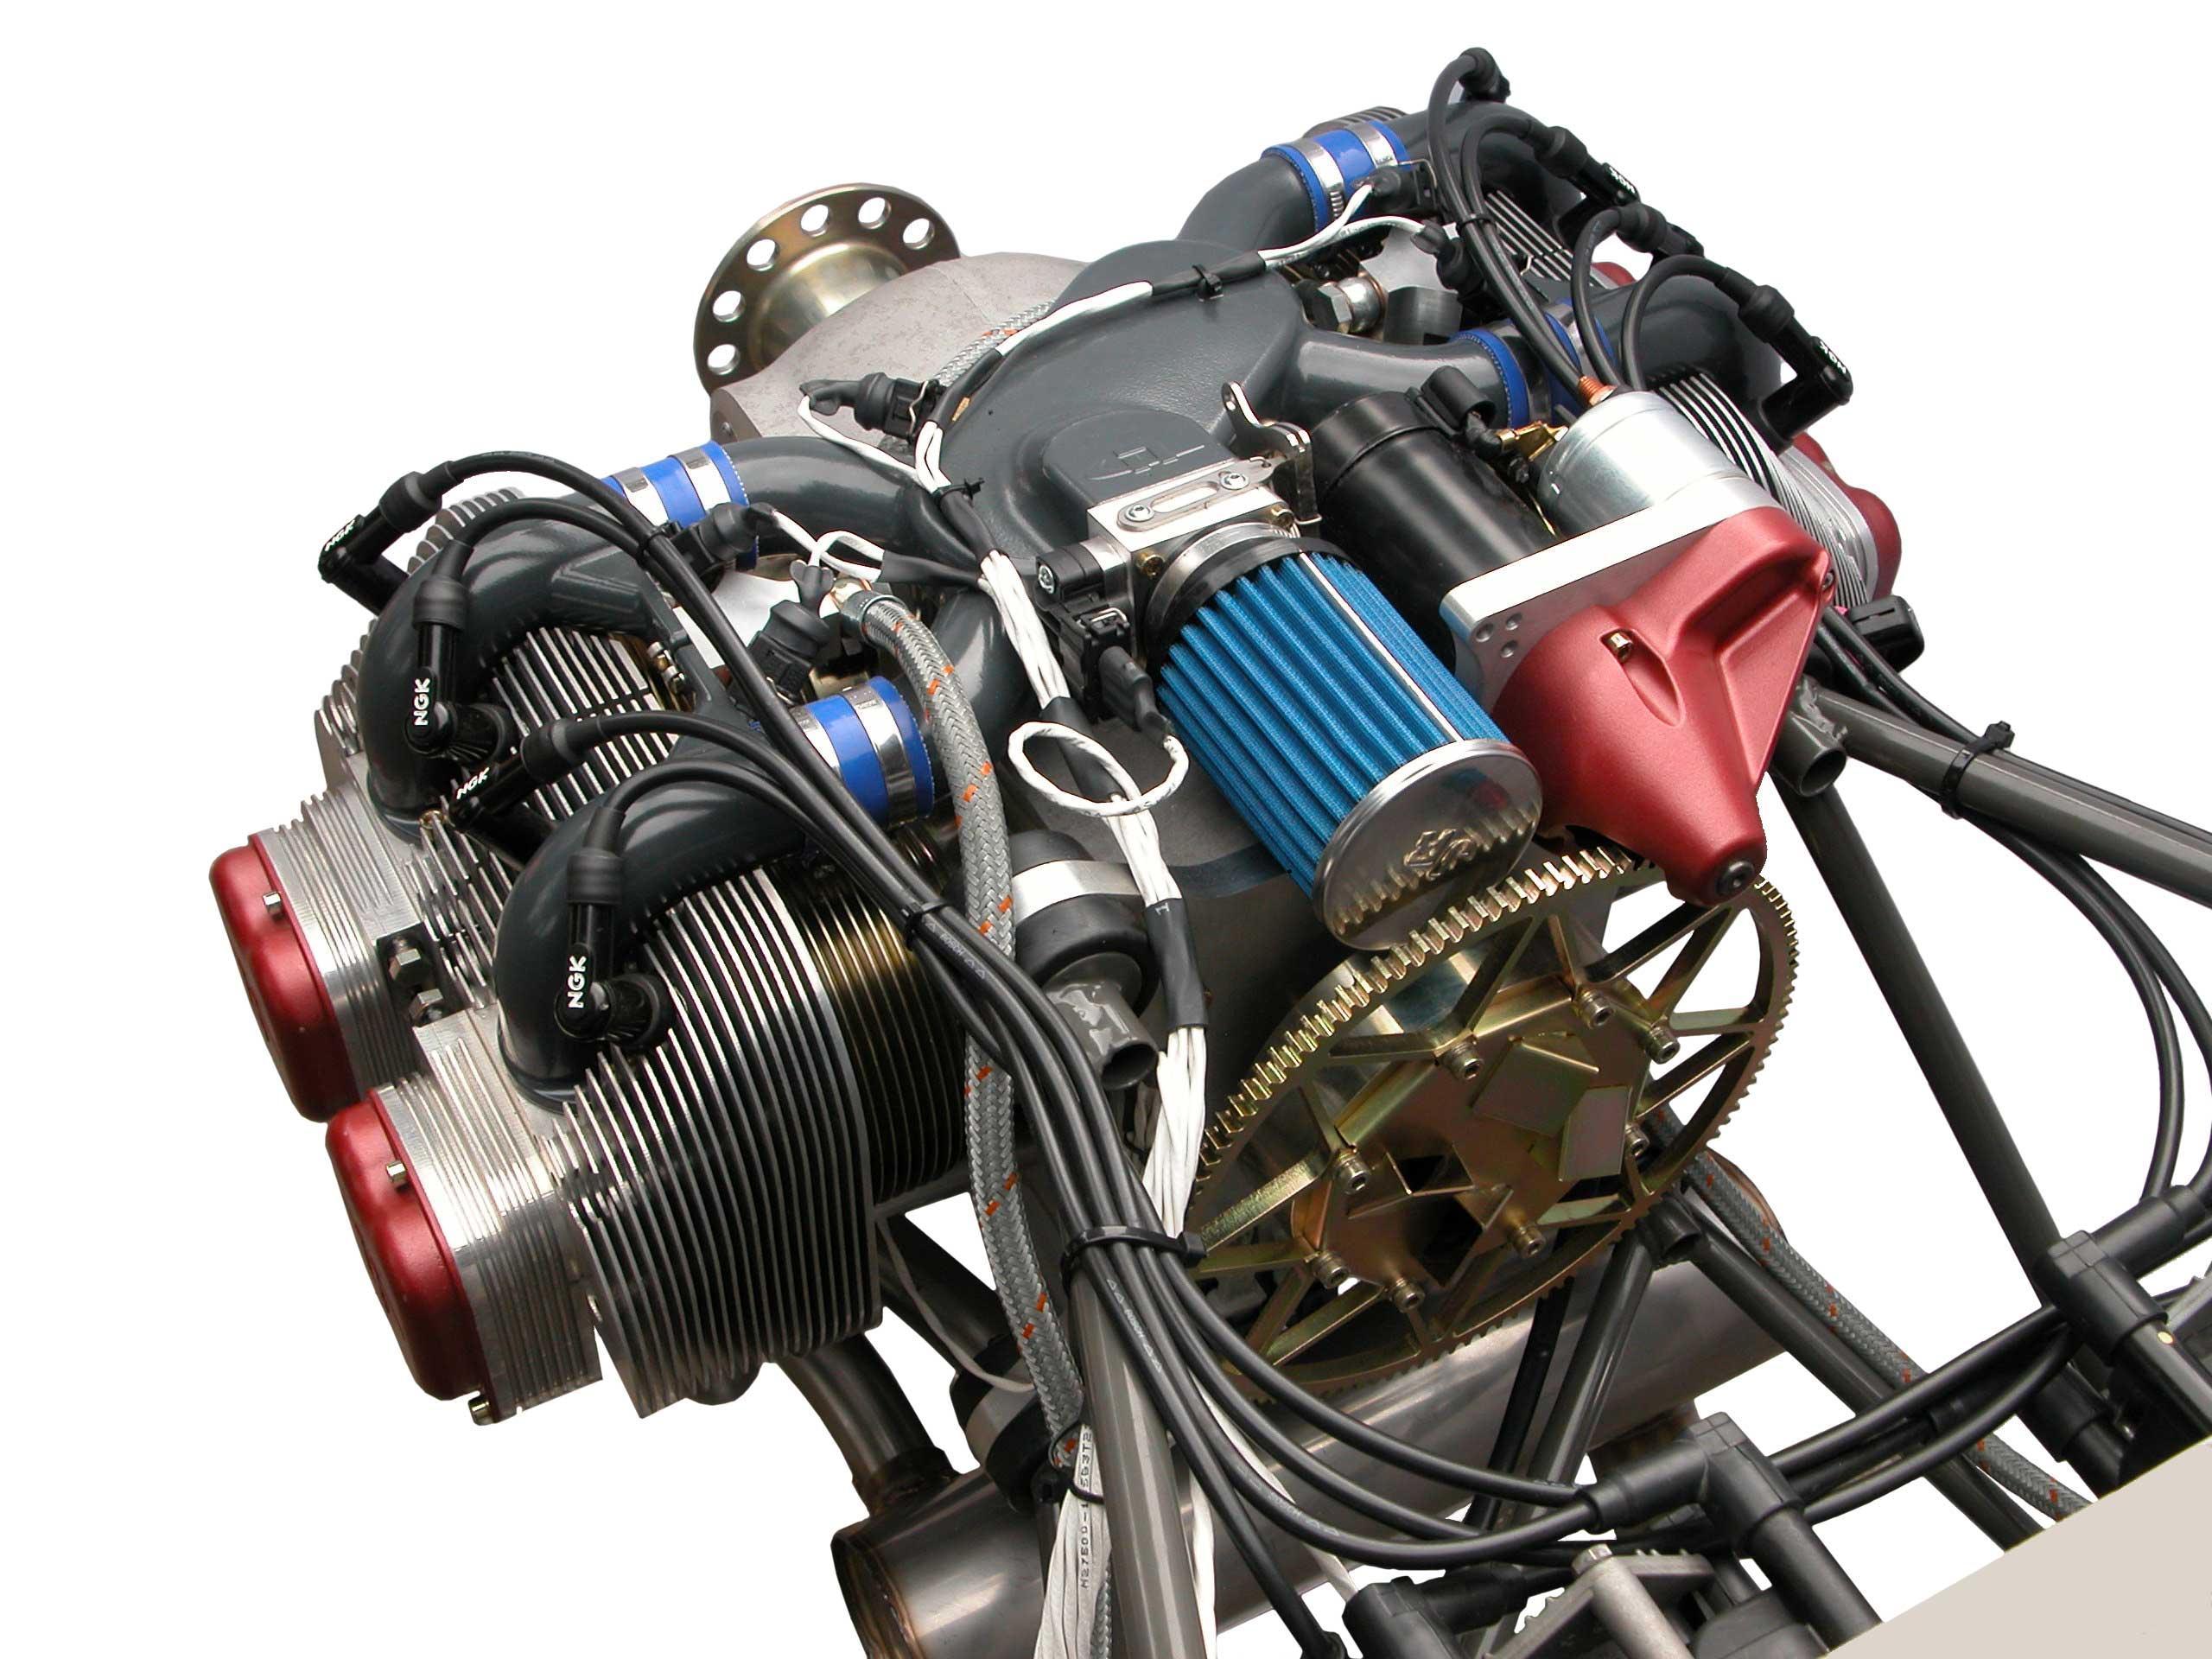 UL260i, UL Power's UL260i 4 cylinder, 4 stroke, electronic ...